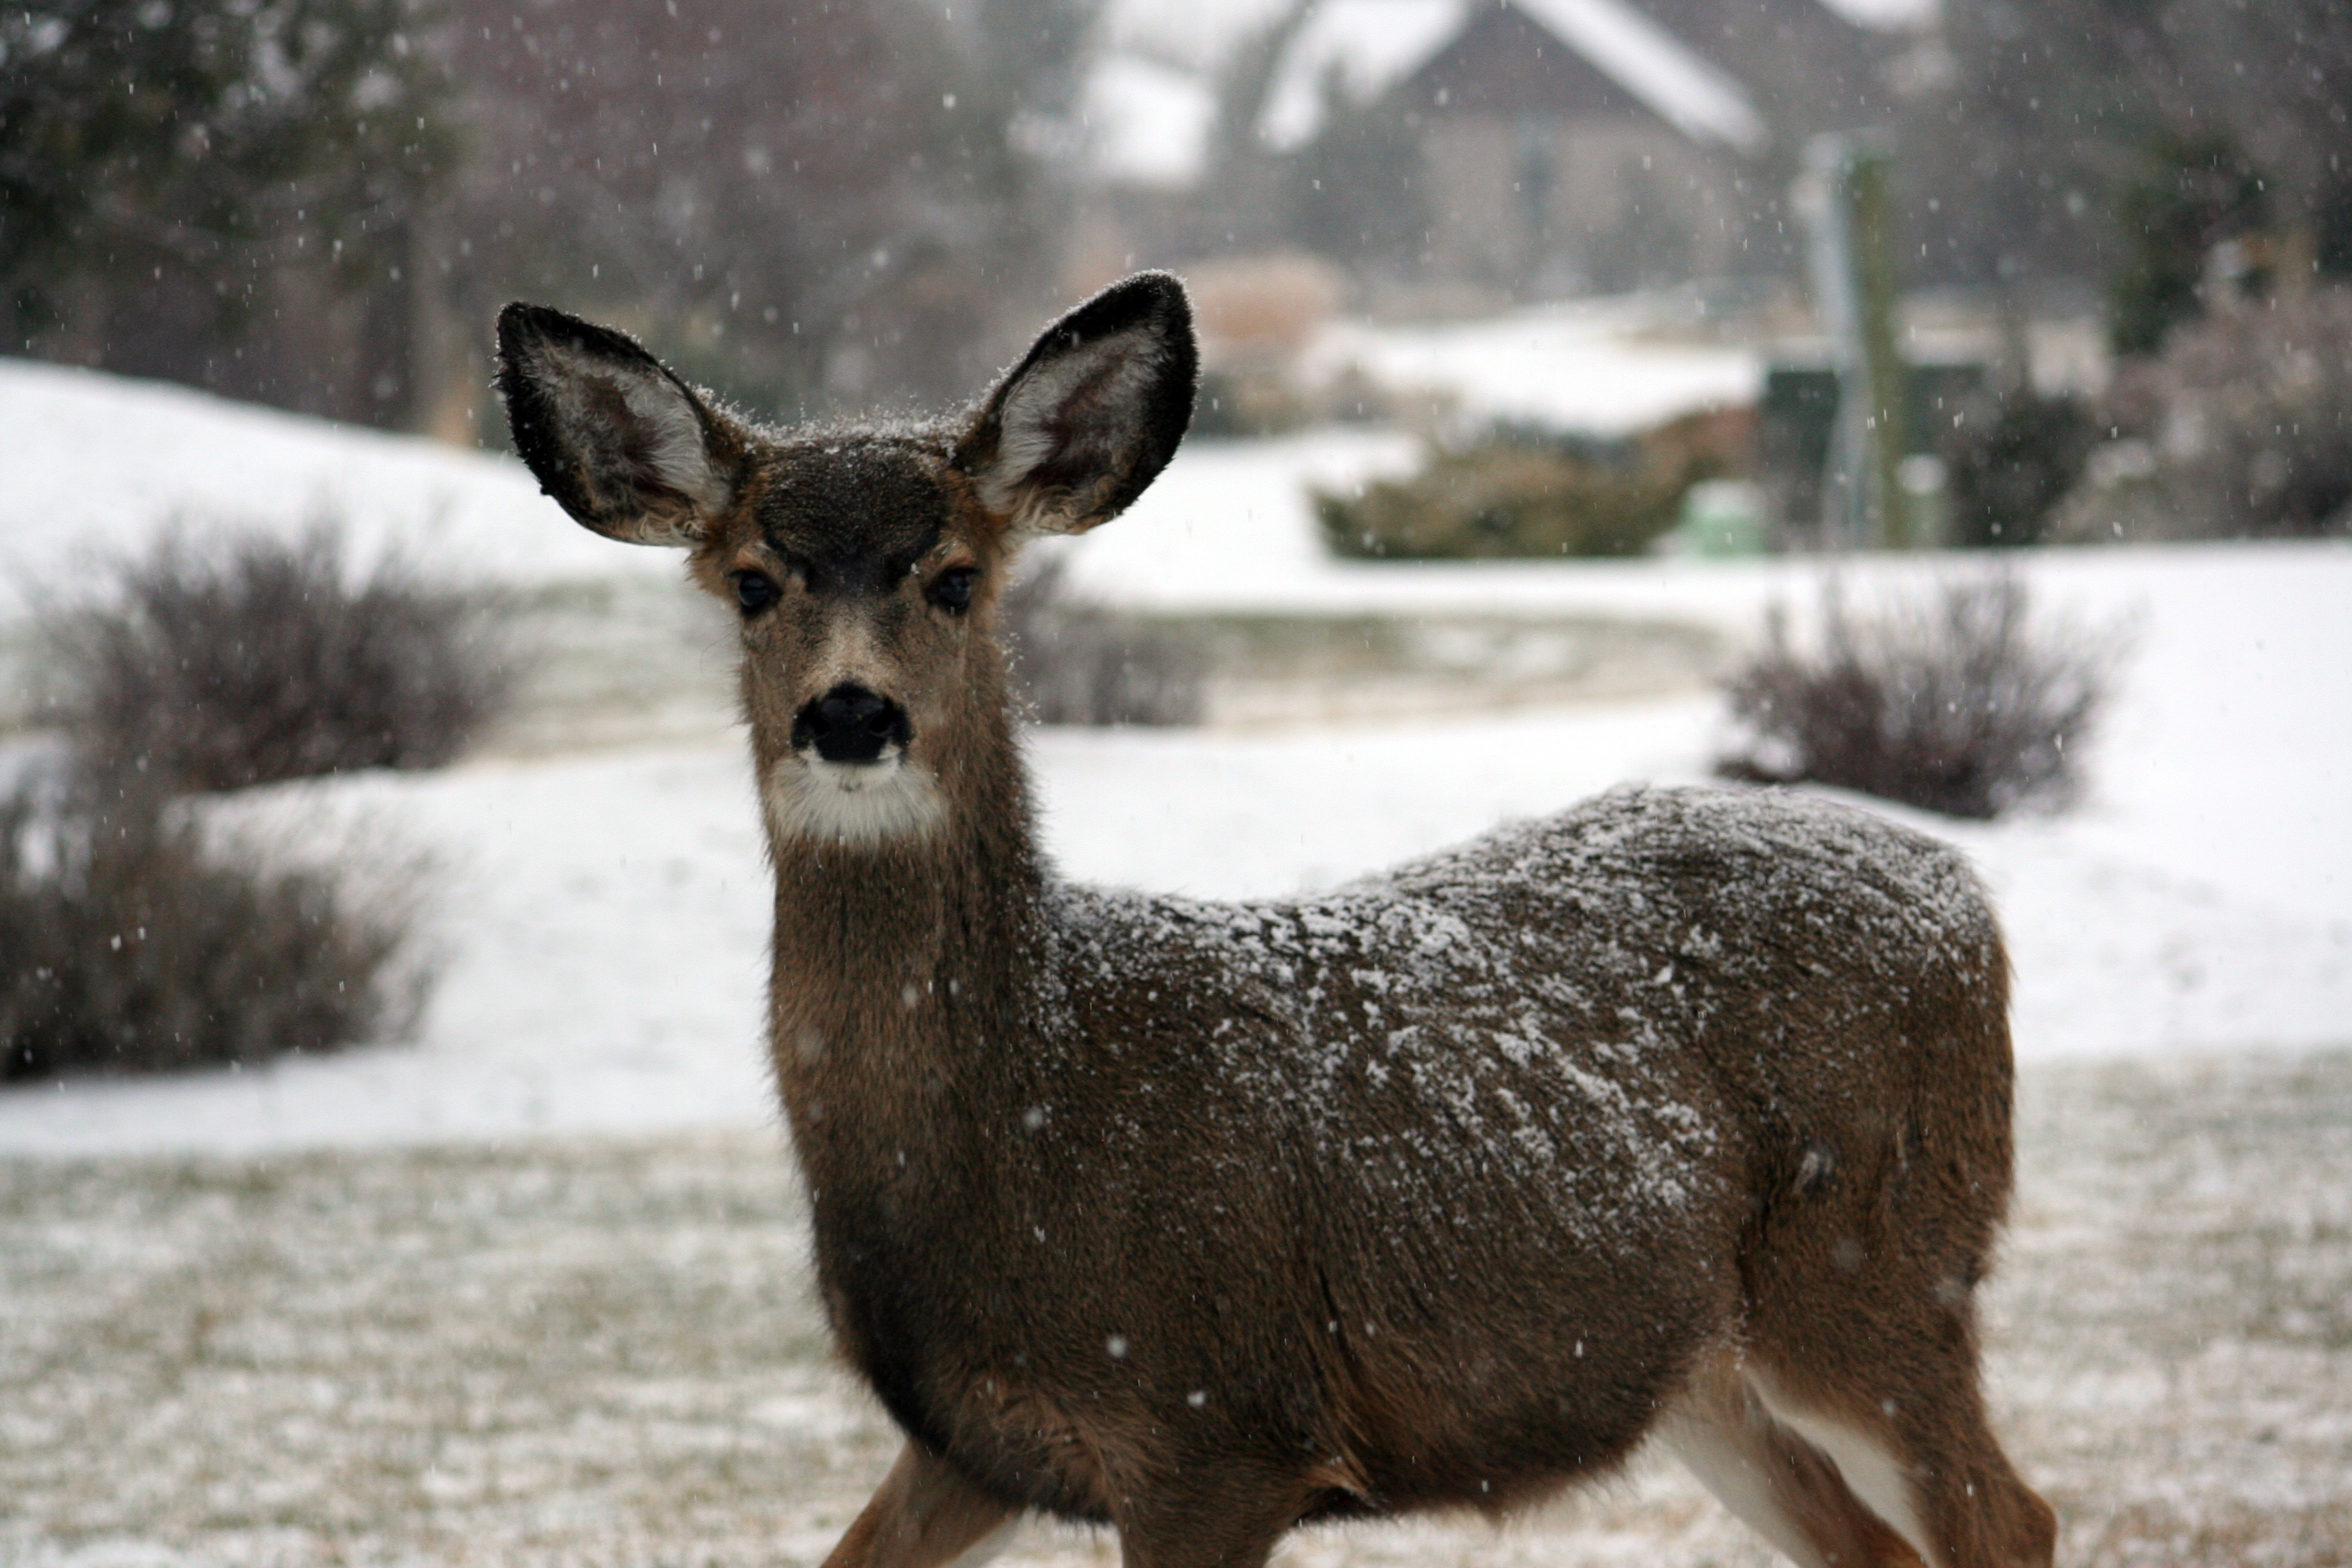 Deer, Animal, Fast, Ice, Landscape, HQ Photo